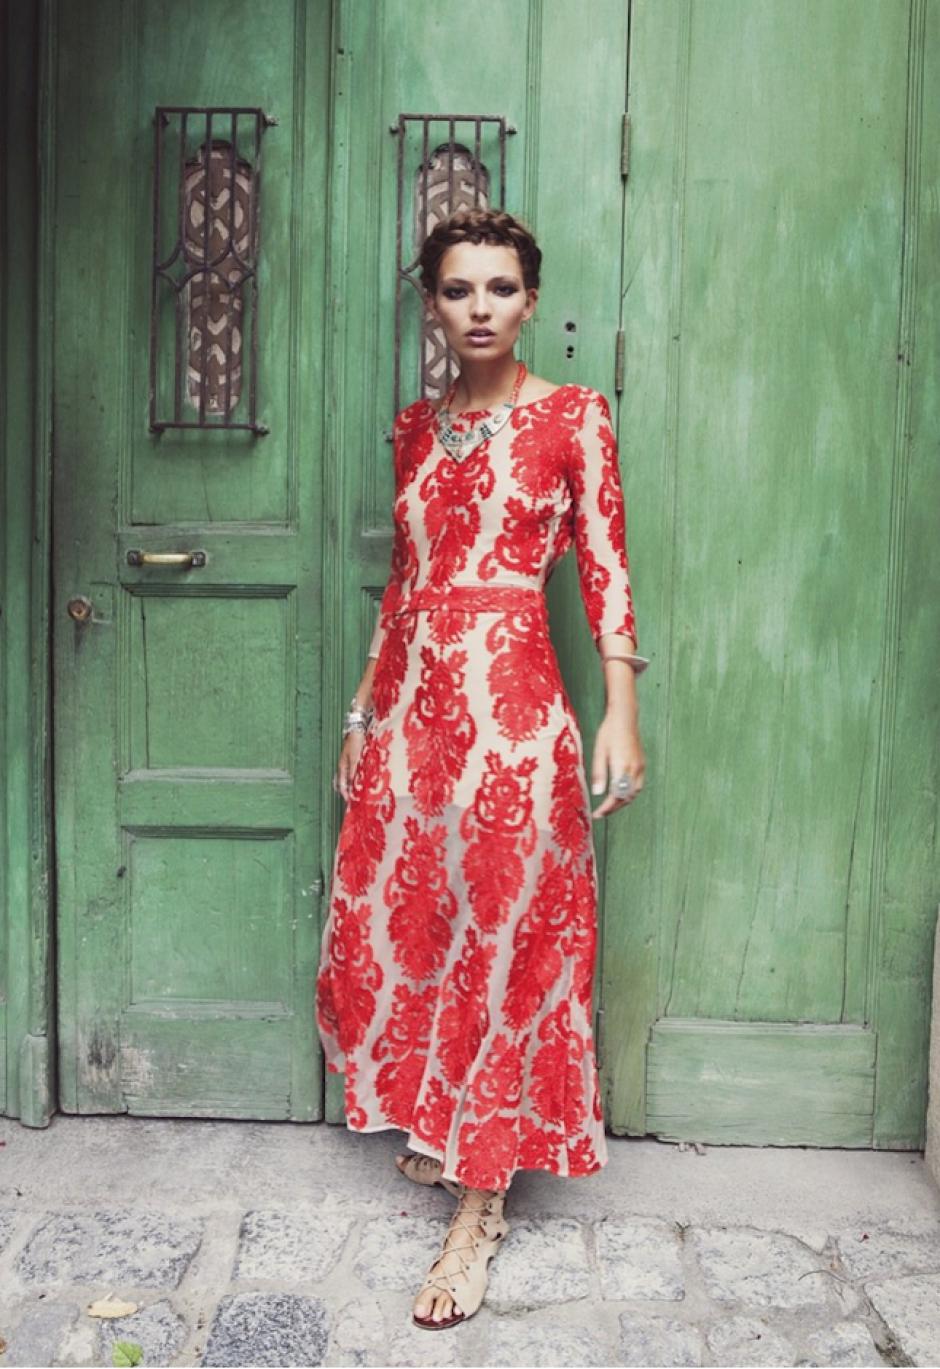 Elegancia boho-chic es la premisa de la marca. (Foto: For love and lemons)